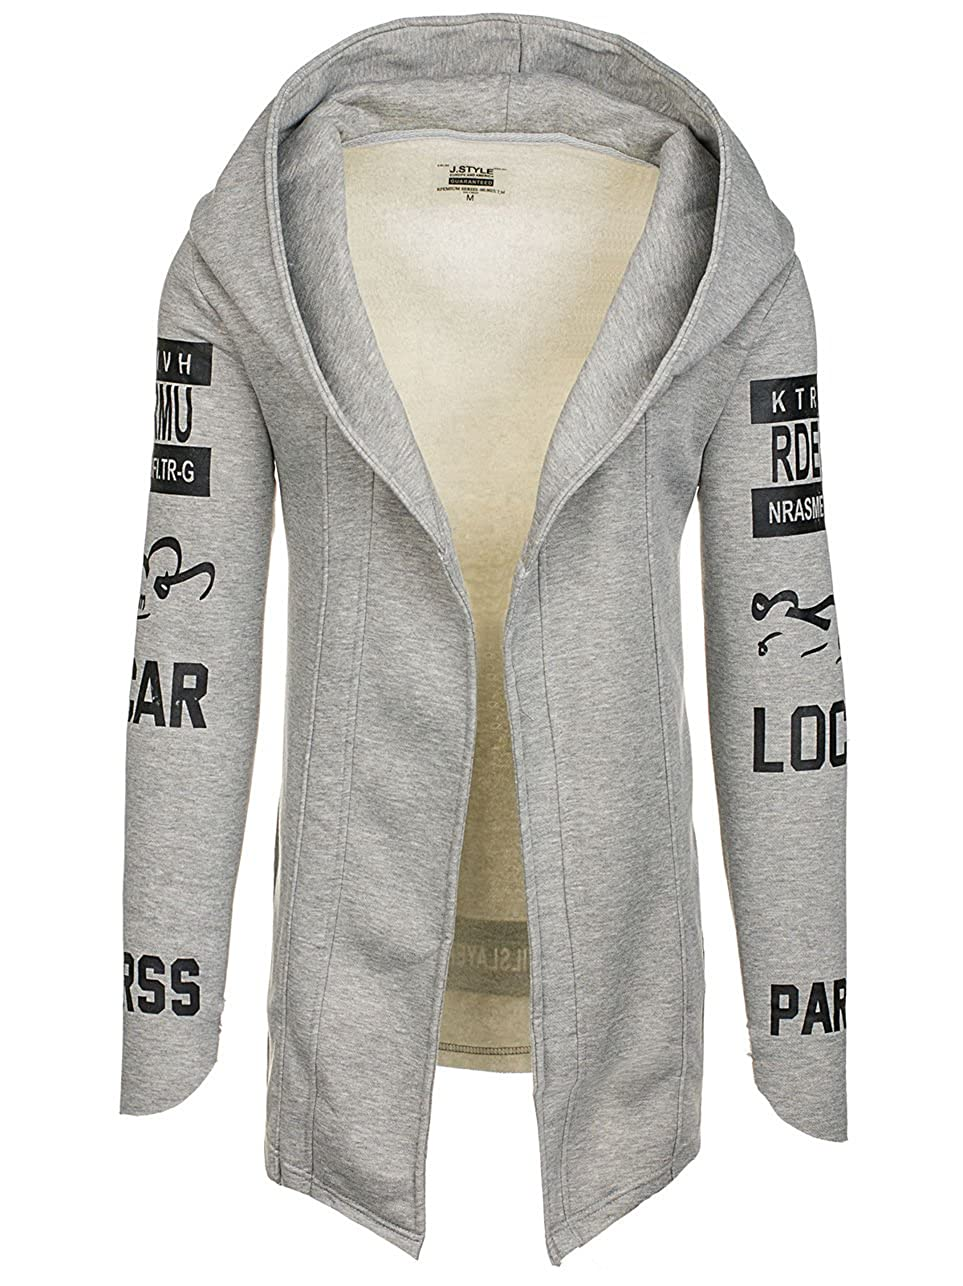 Herren Kapuzenpullover Sweatjacke Sweatshirt Hoodie Asymmetrisch BOLF 1A1 Motiv